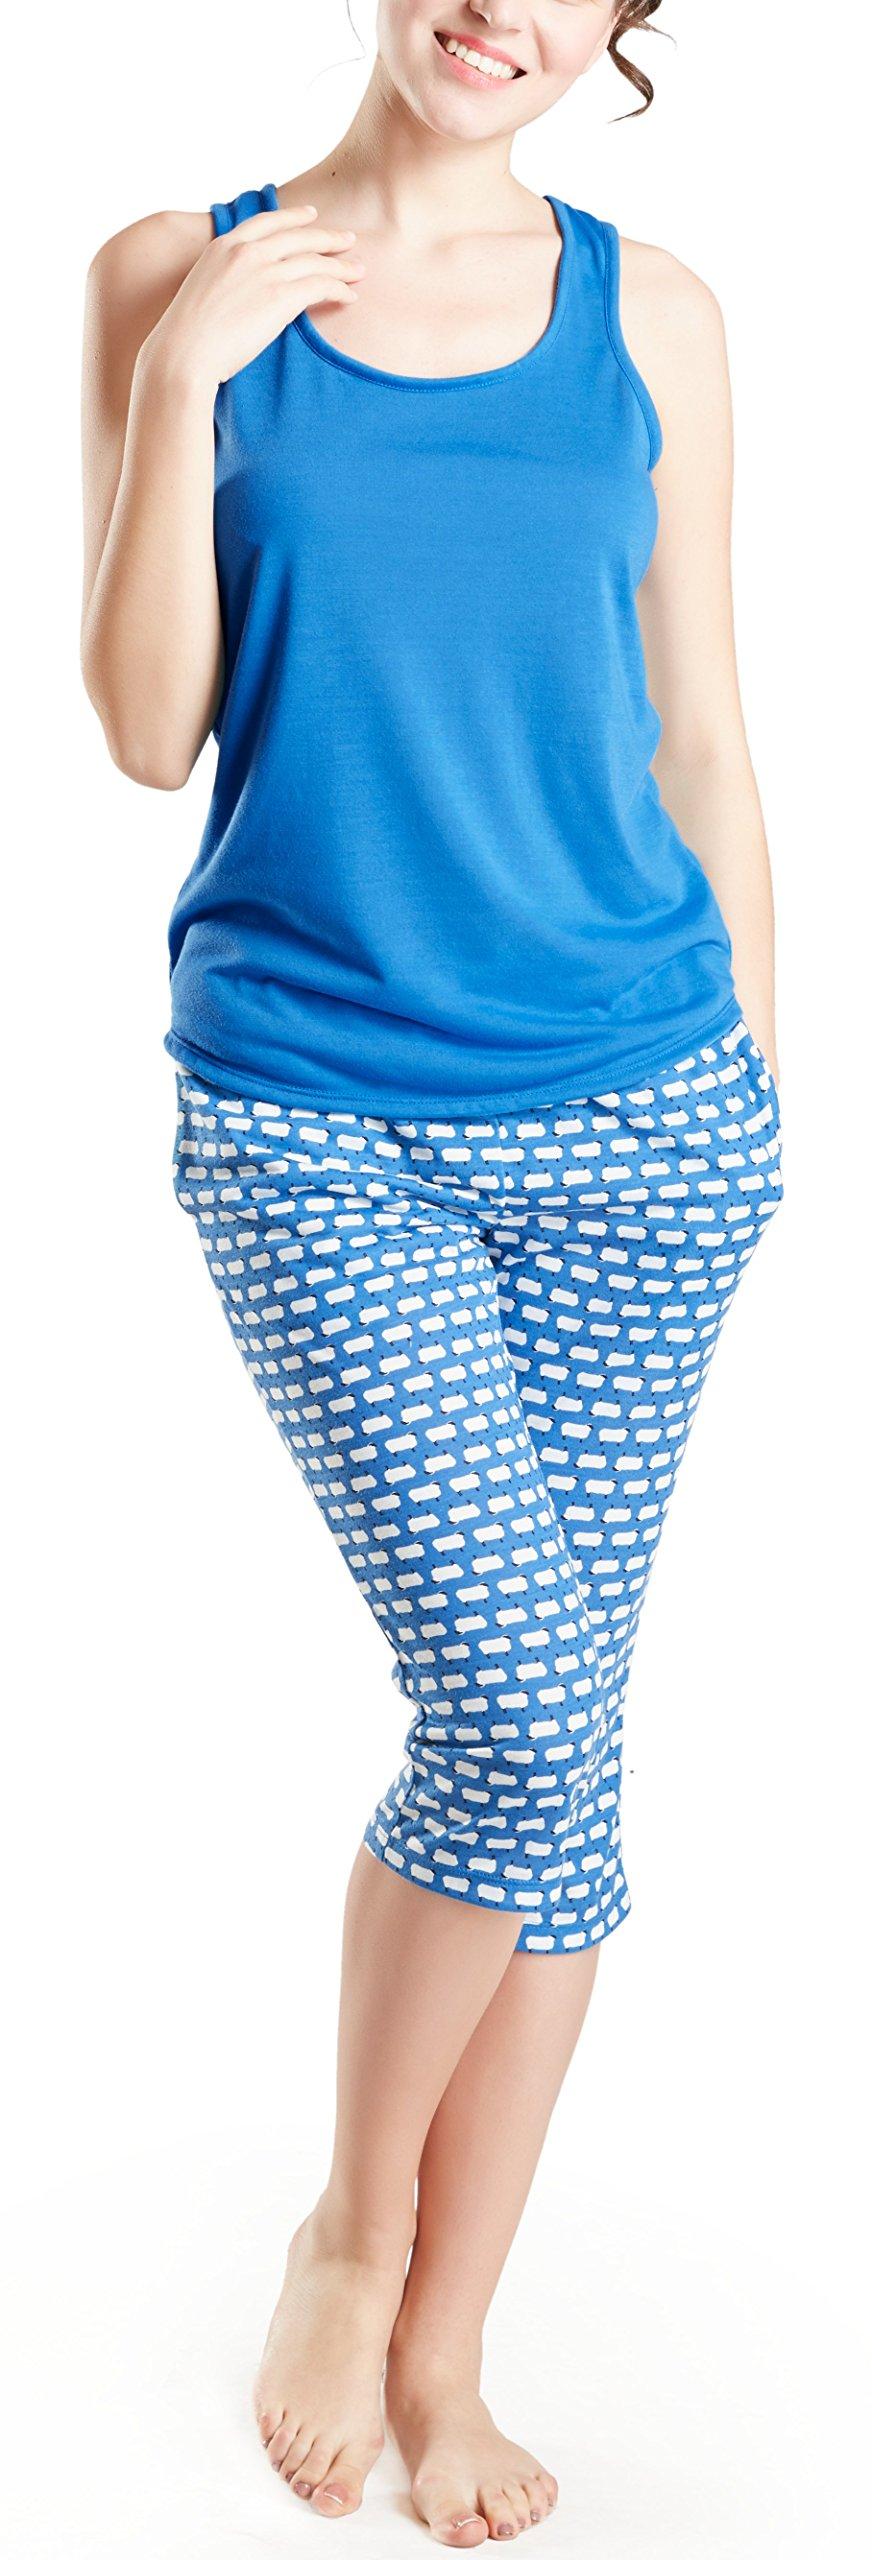 Summer Pajamas for Women, Cute Print Capris Pajama for Woman - Pjs Women Jersey Tank Top and Capri Jogger Pants Set Counting Sheep XL